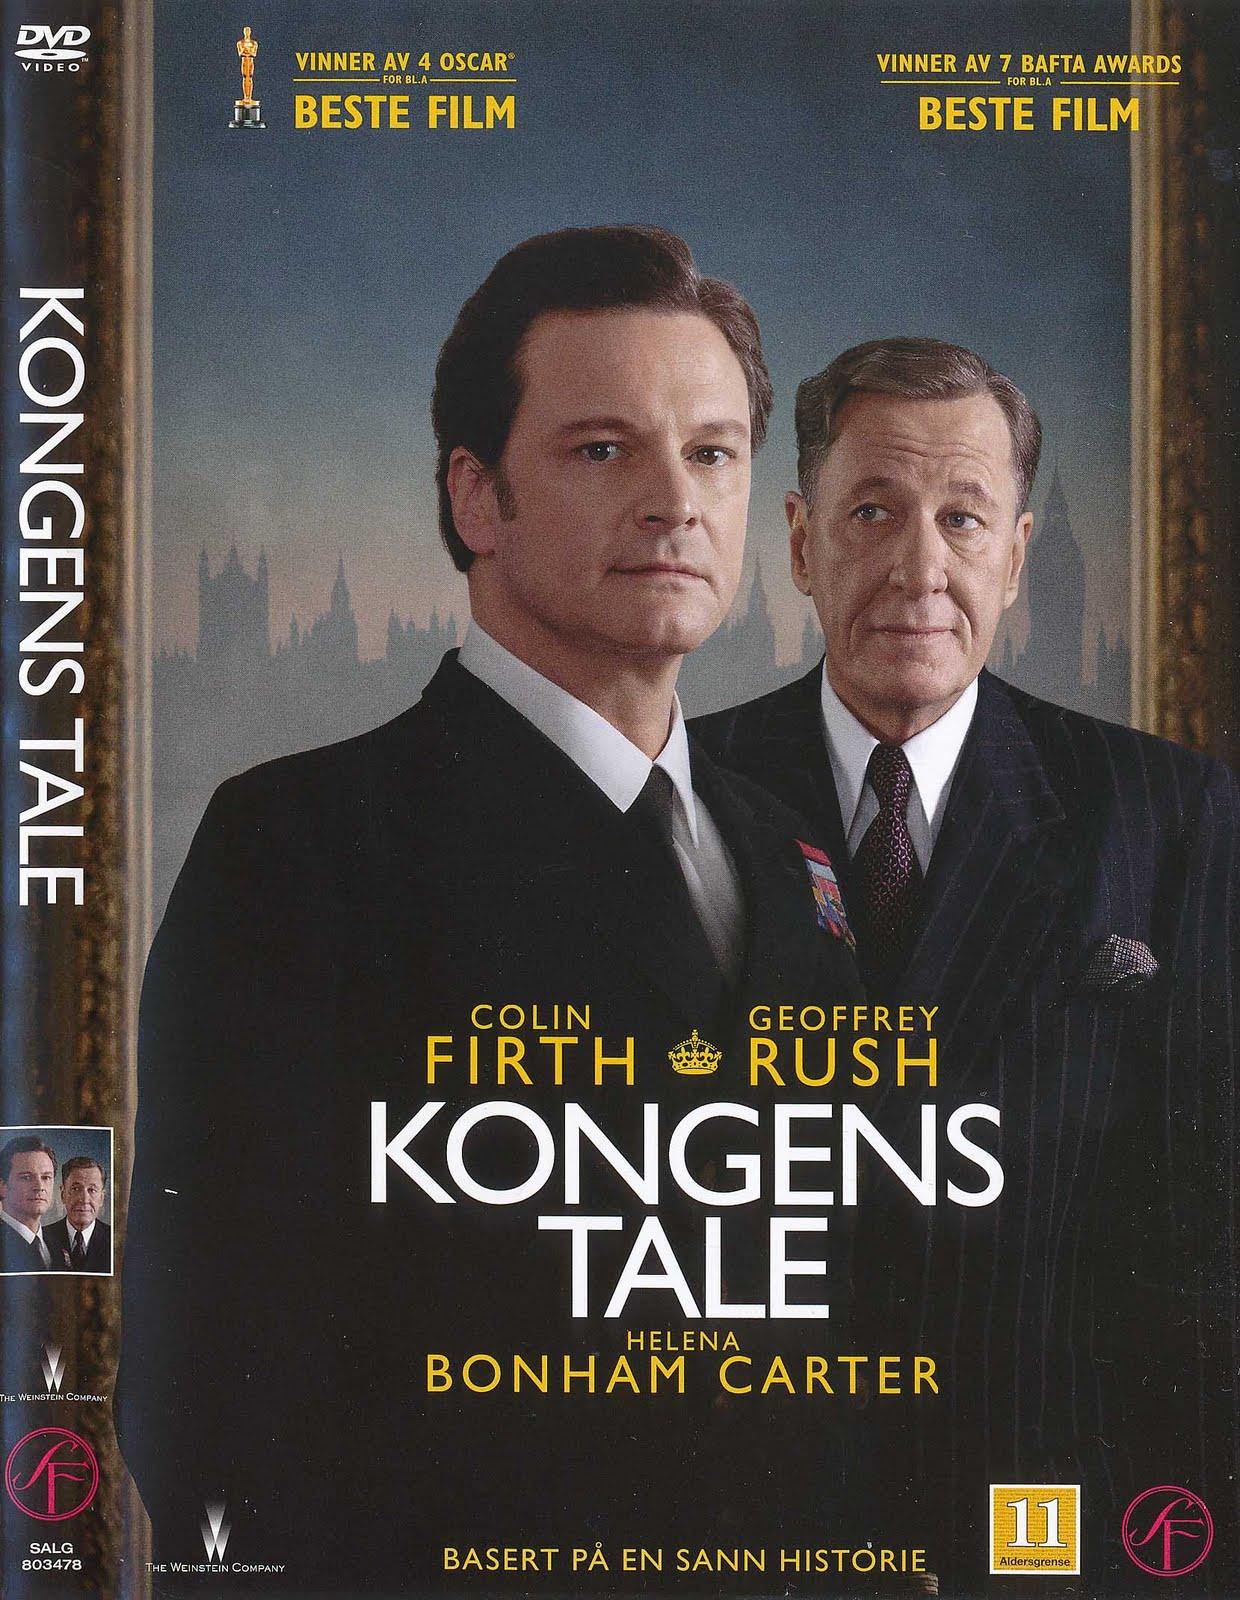 http://3.bp.blogspot.com/-put5TxF4JHw/TiVpEkXGGRI/AAAAAAAACRs/iqwhhVn_kJk/s1600/Kongens-tale-cover-1.jpg